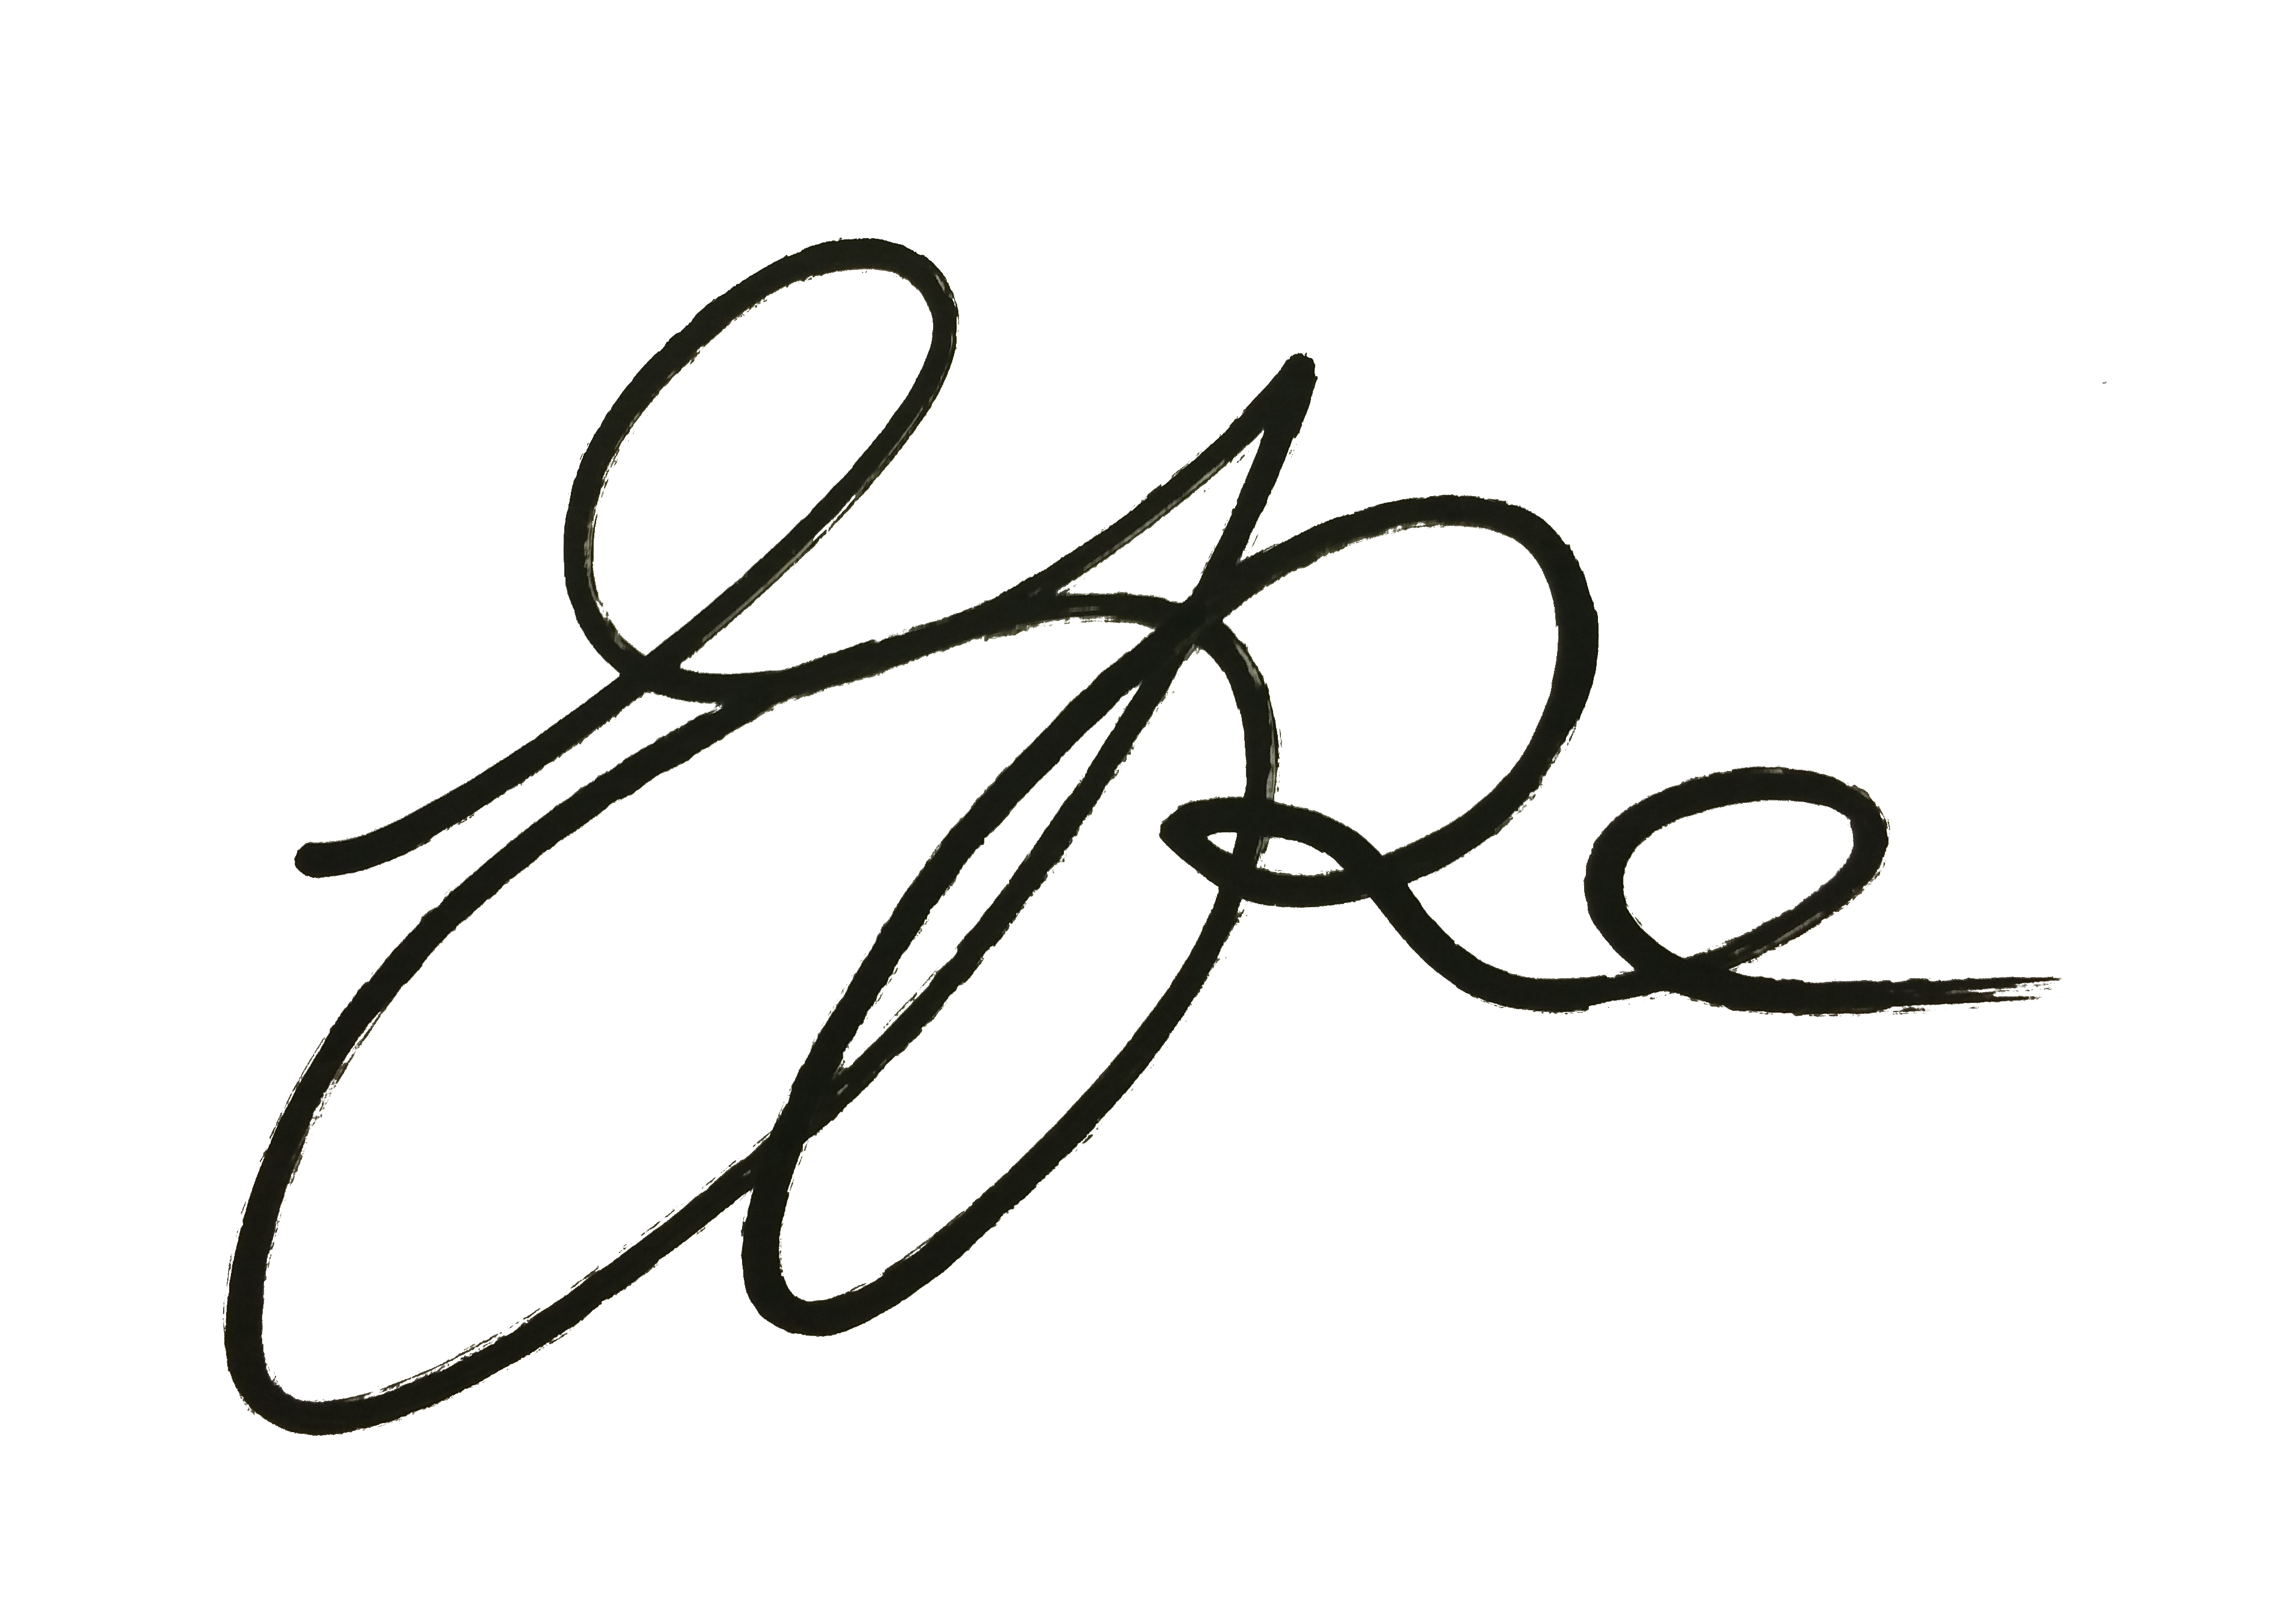 Matthew Jupe's Signature